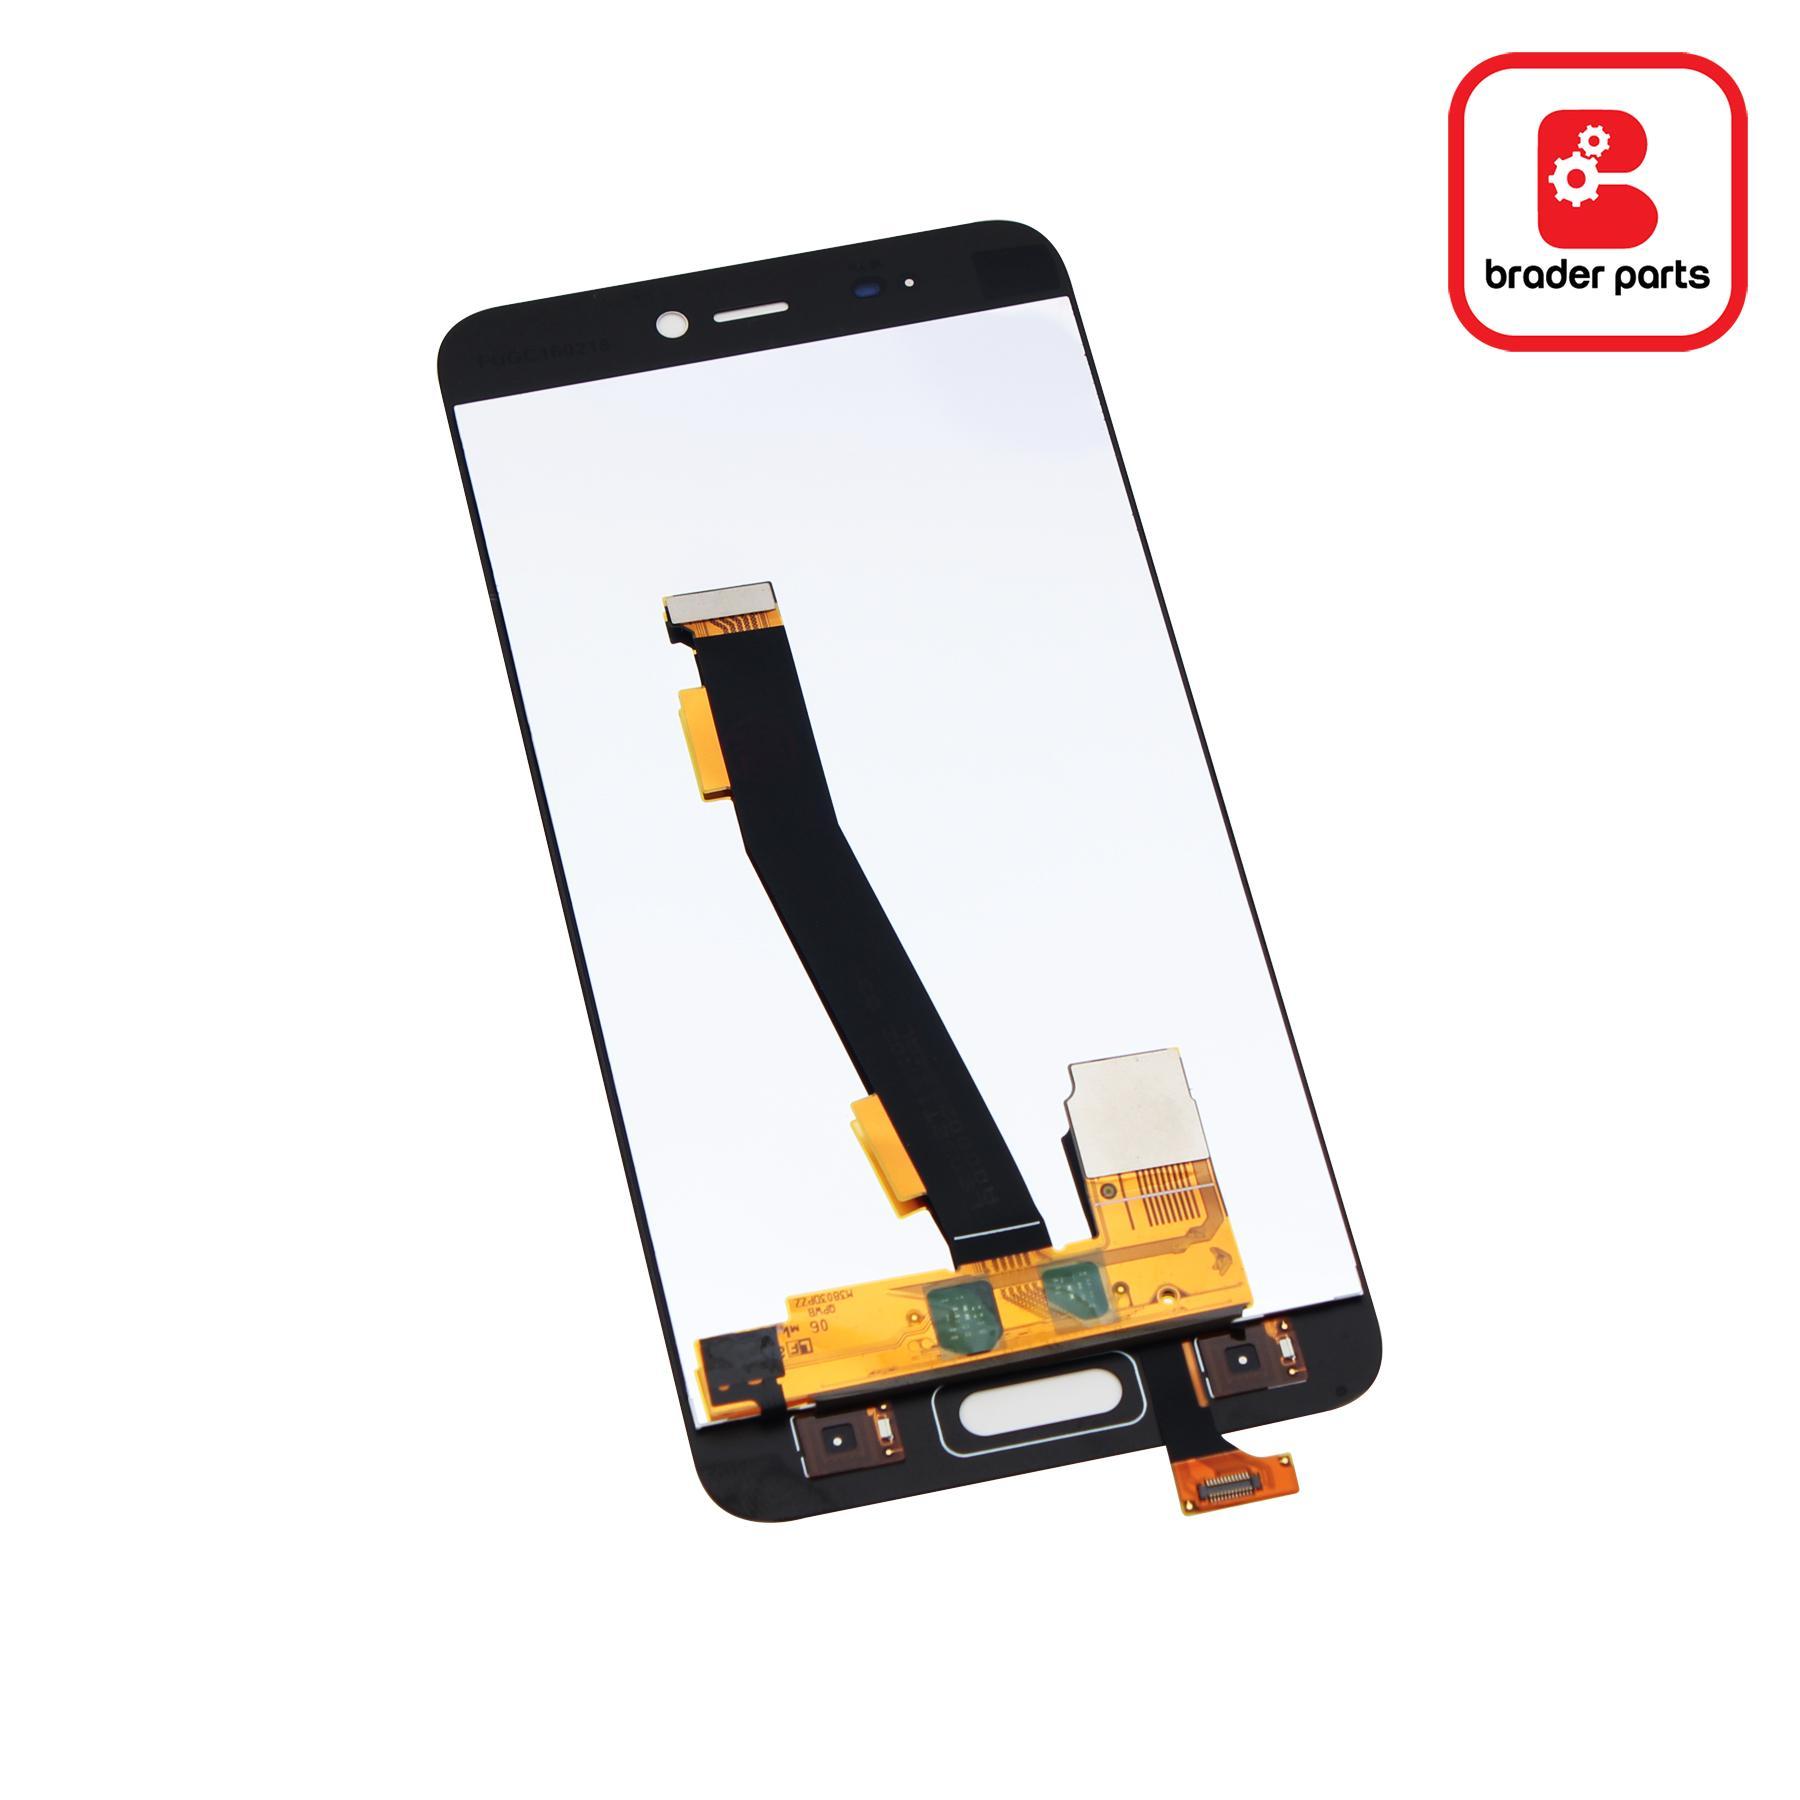 Features Xiaomi Original Lcd Mi4s Gold Dan Harga Terbaru - Harga ... fbd325c54a